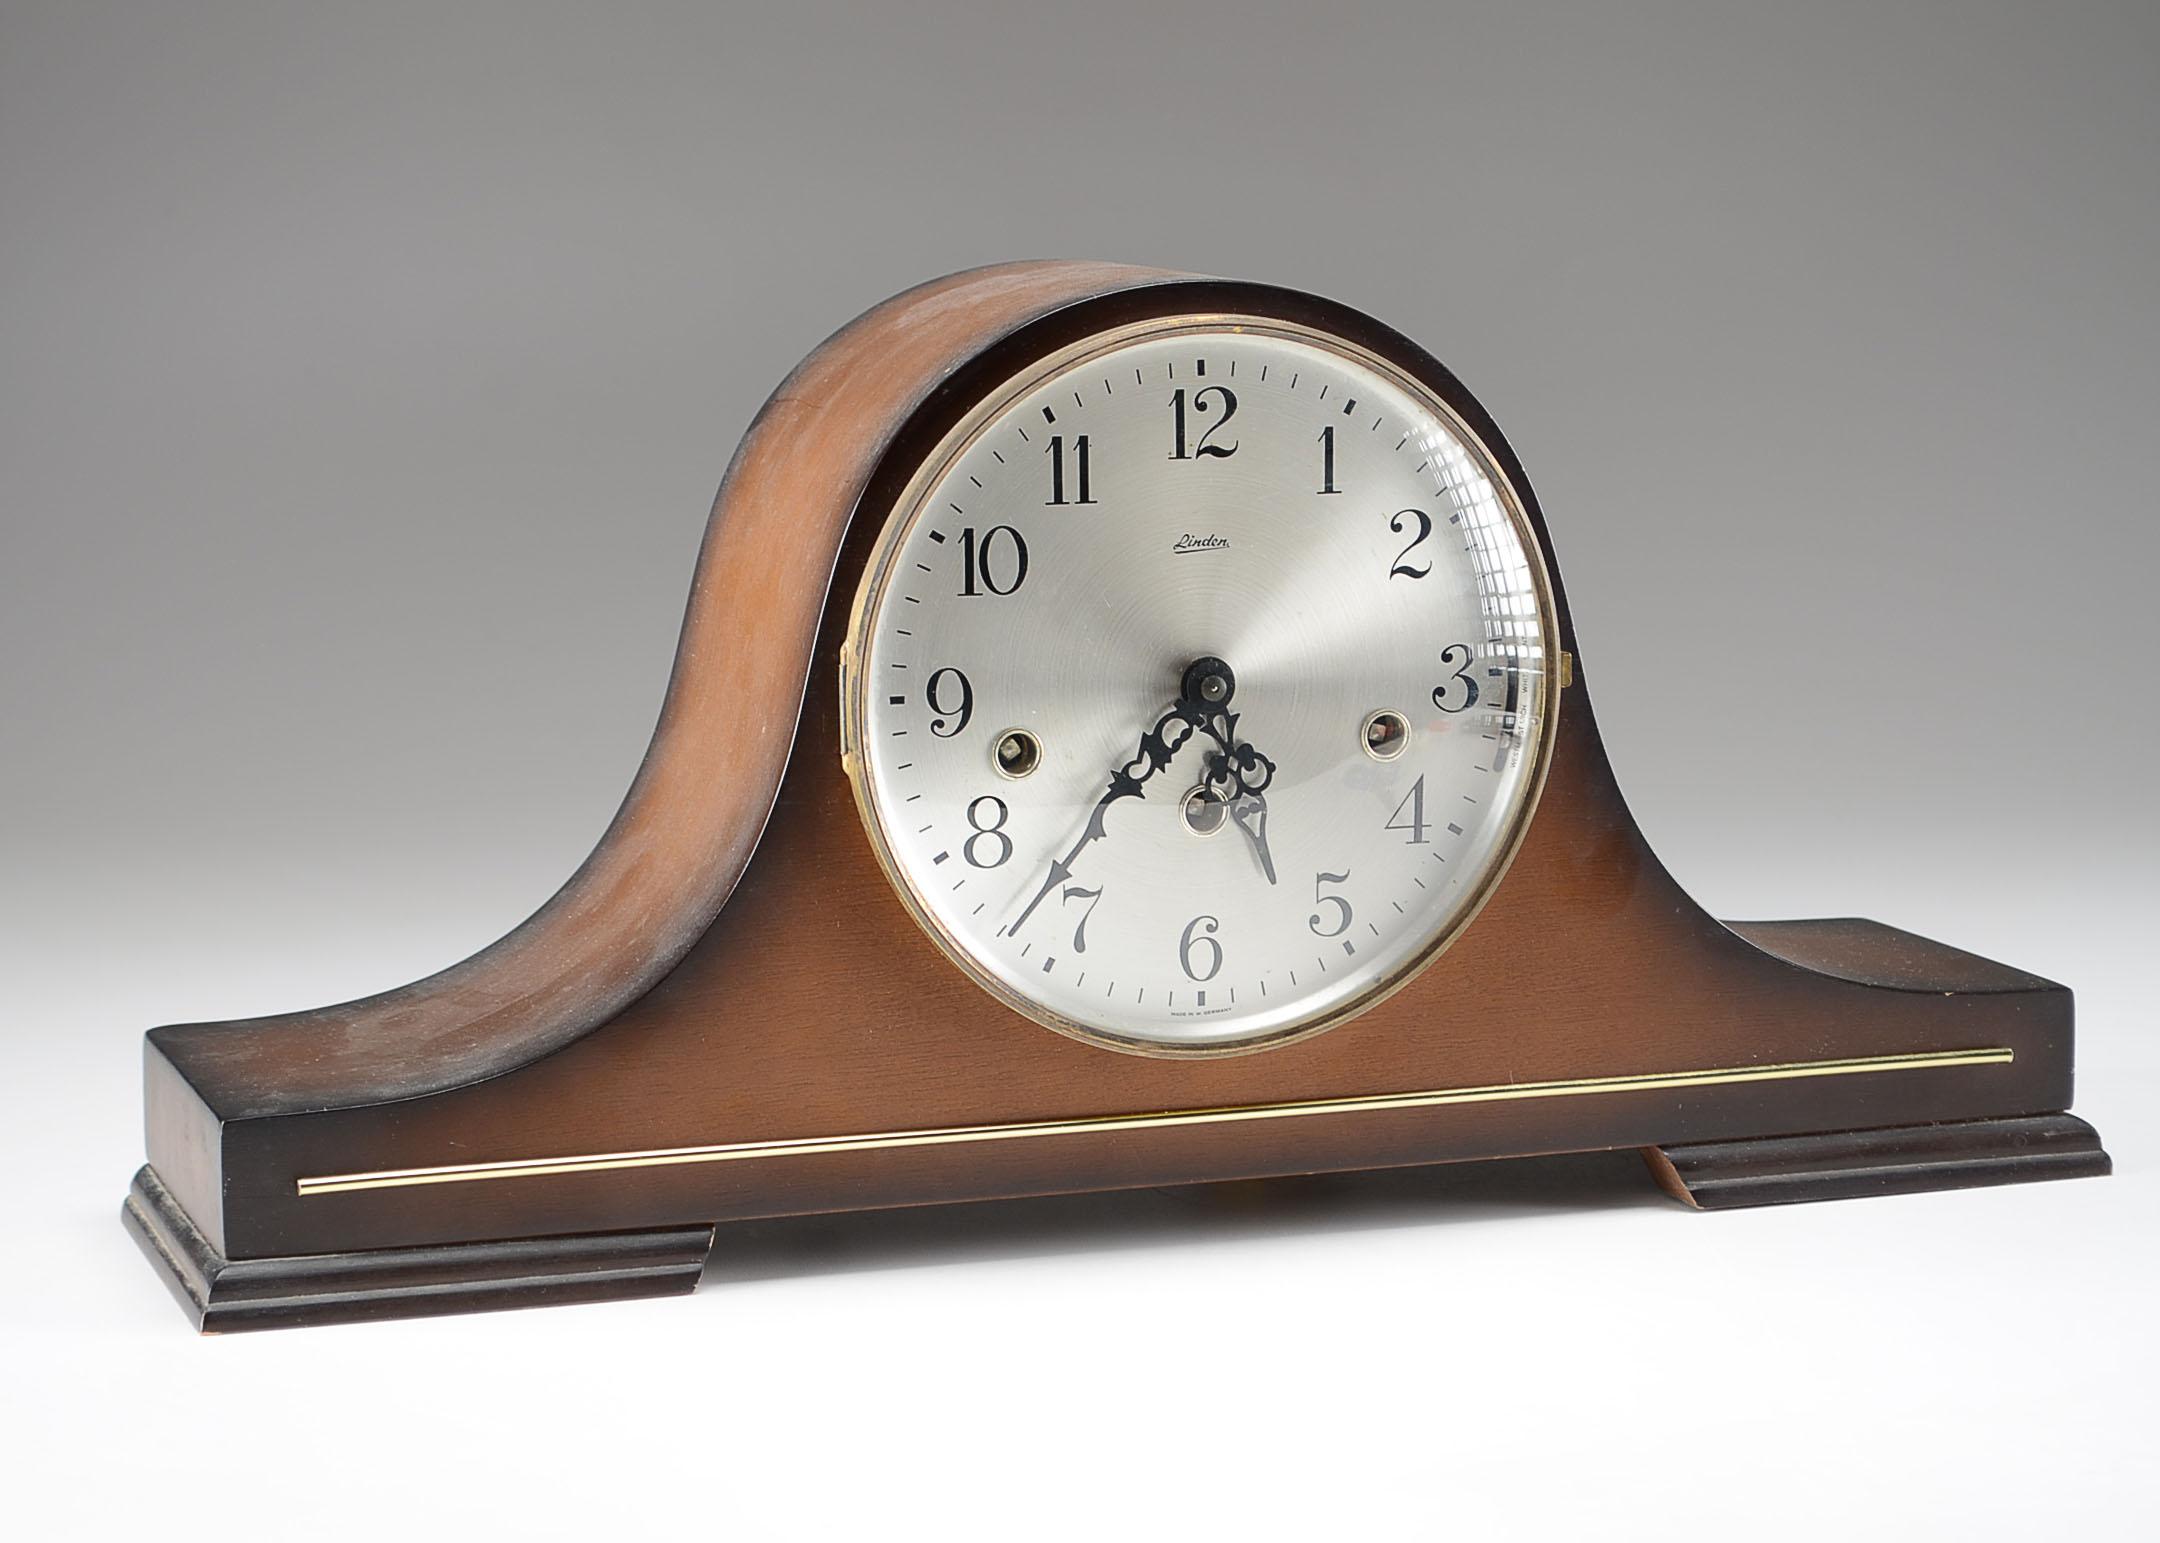 Linden u0026quot;Tambouru0026quot; Mantel Clock : EBTH